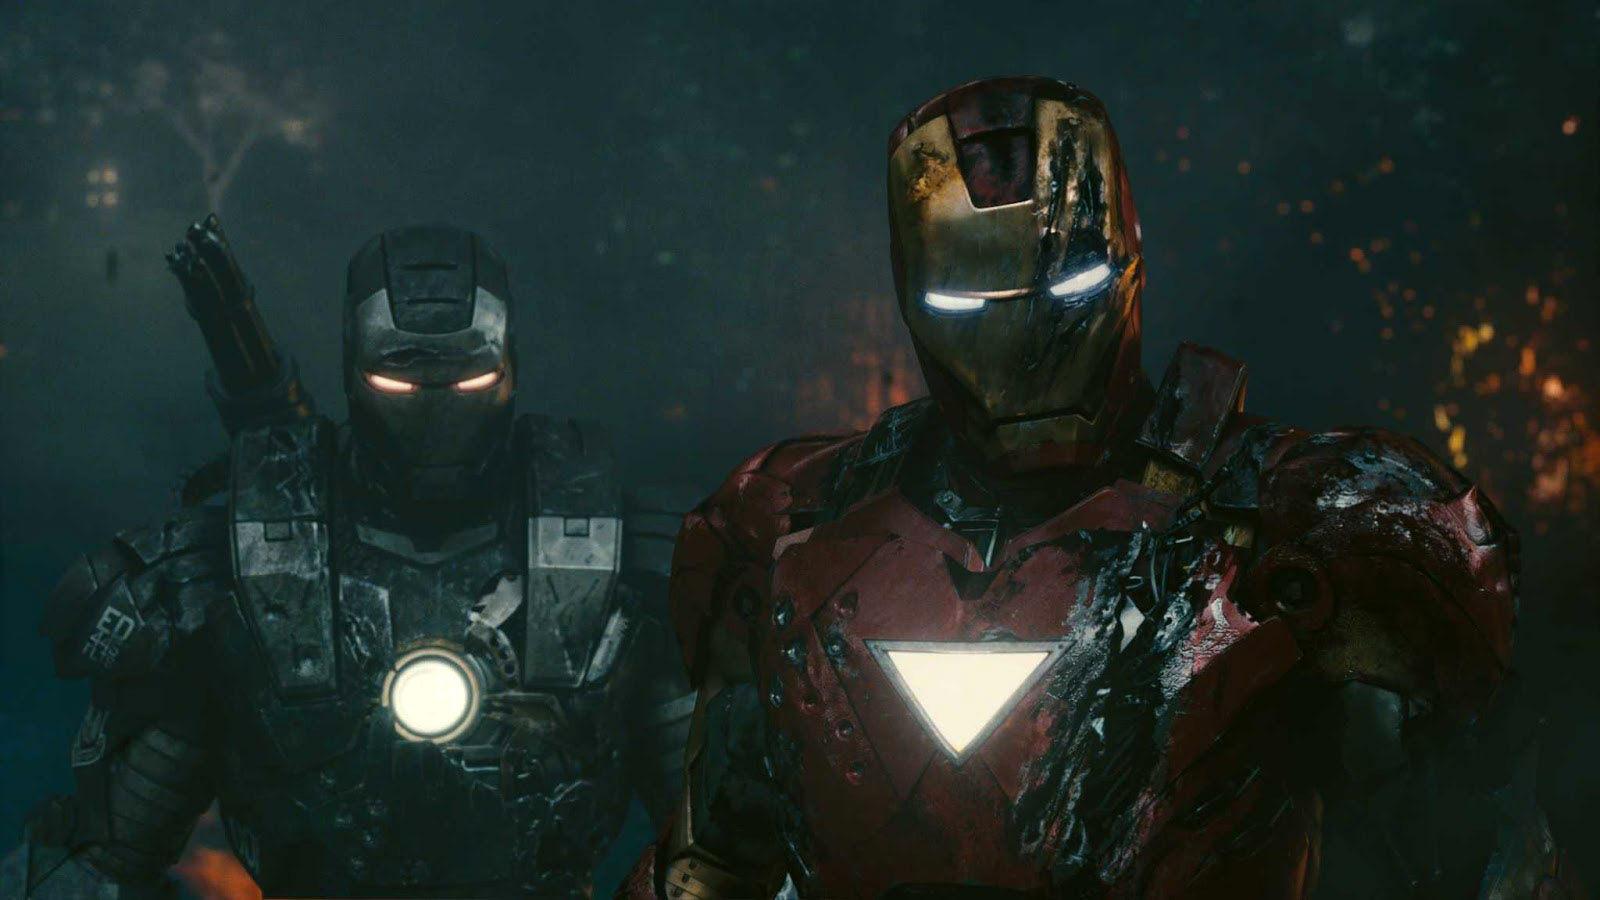 image - iron-man-2-still-war-machine-mark-v | iron man wiki